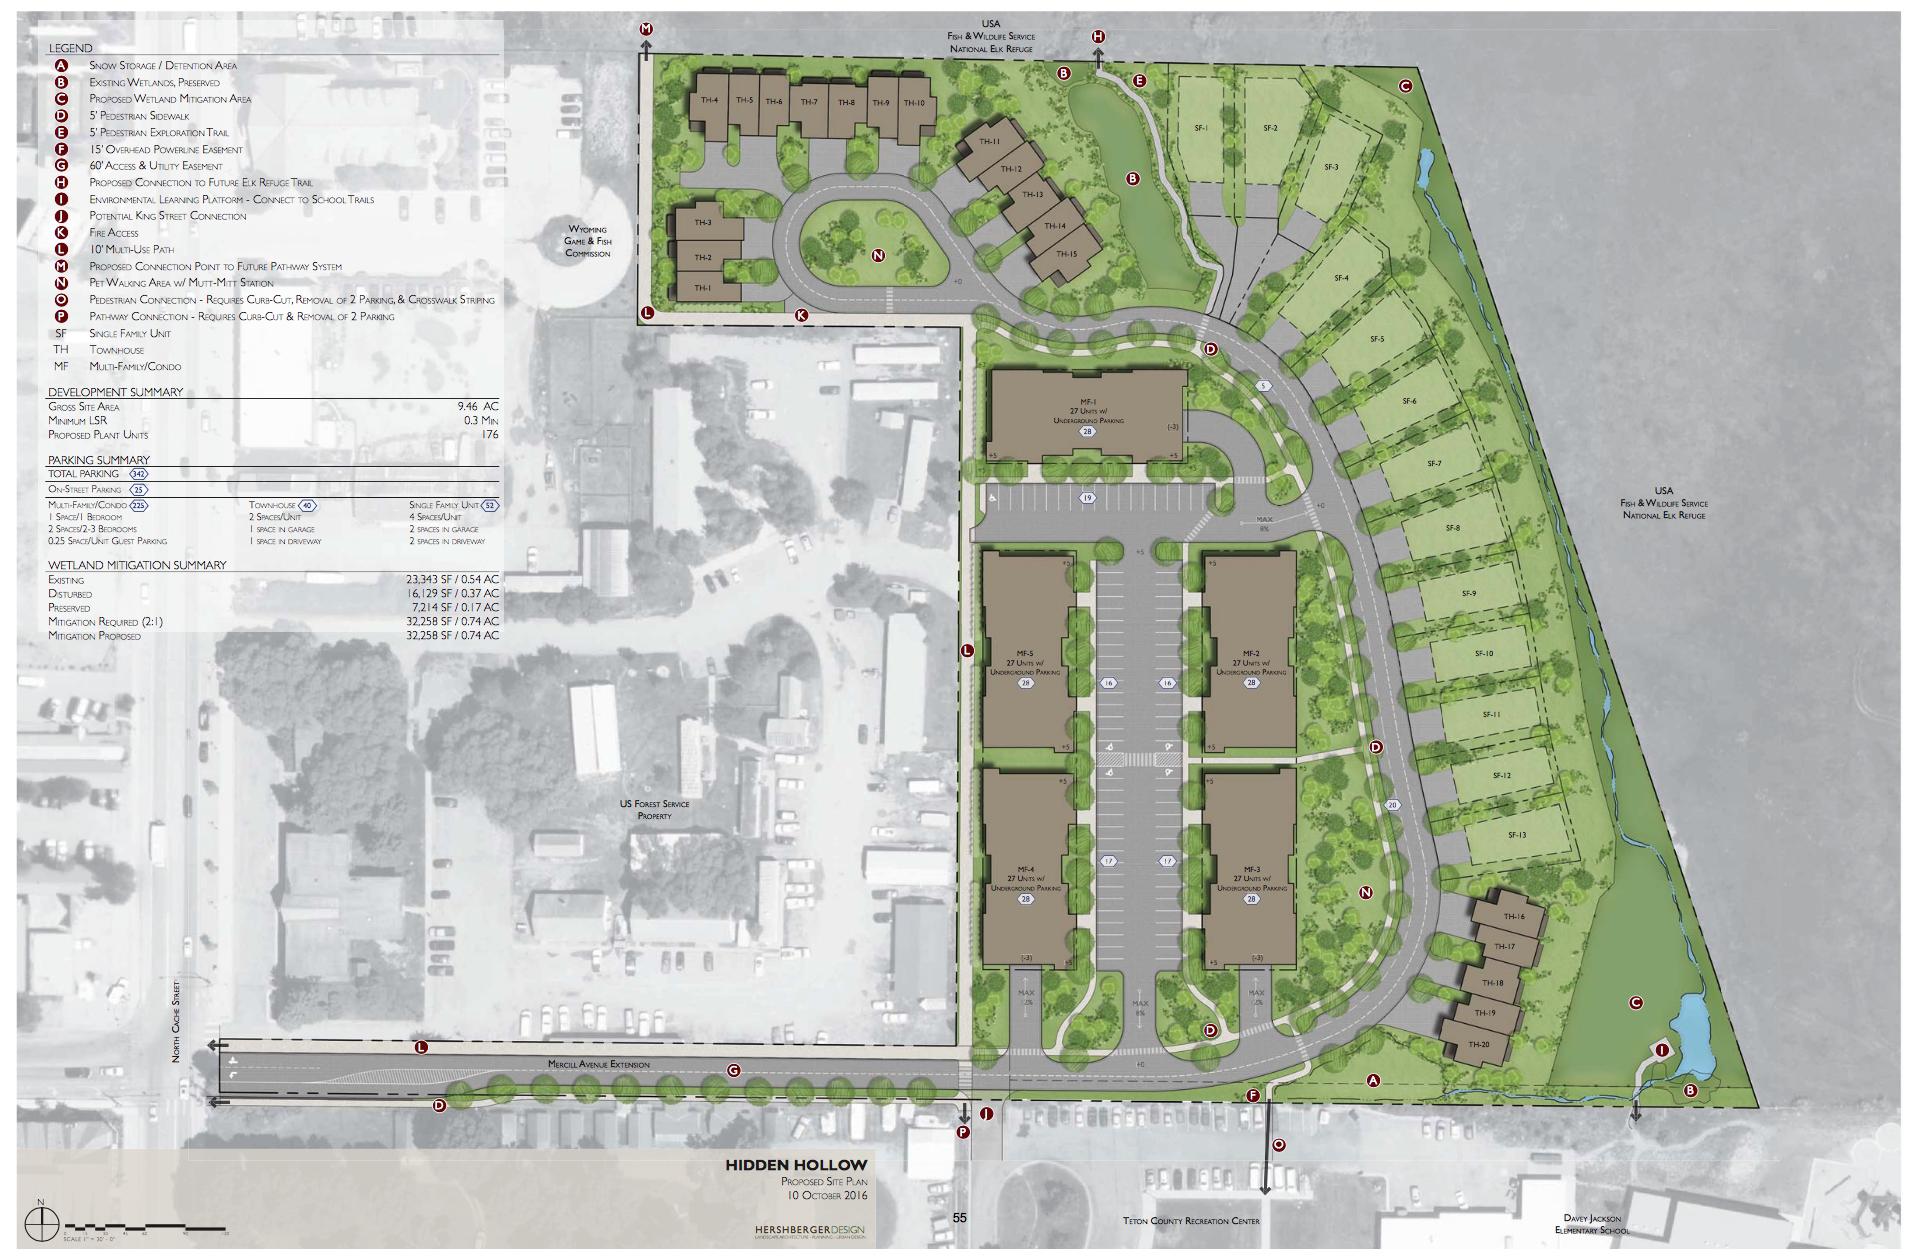 Hidden Cost: dense neighborhood headed for Jackson